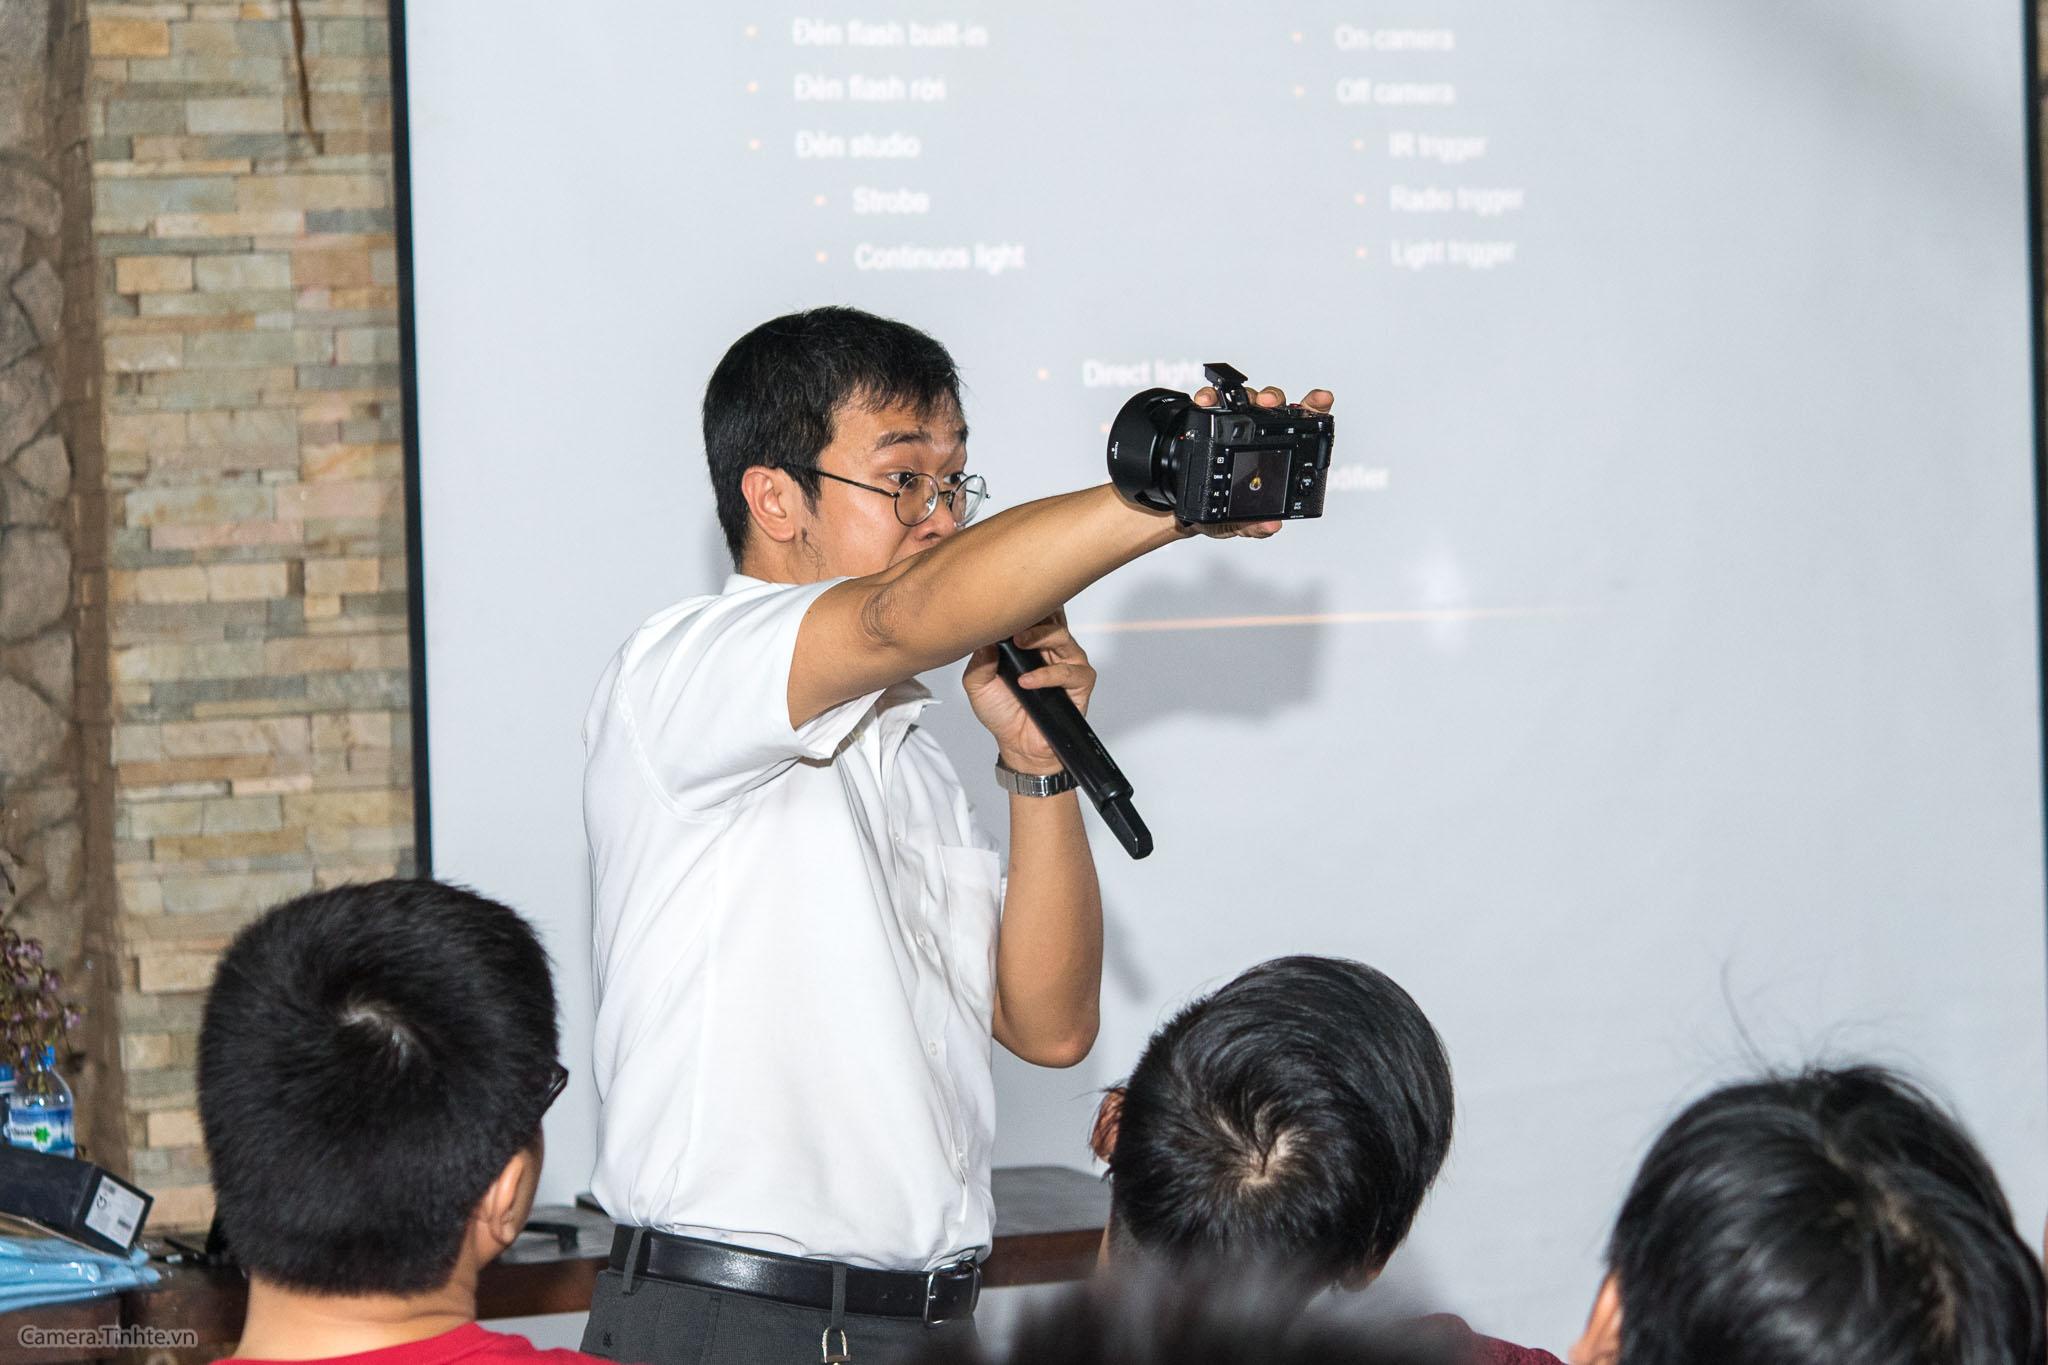 NACB 3 - Flash 2 - Camera.tinhte.vn-6.jpg